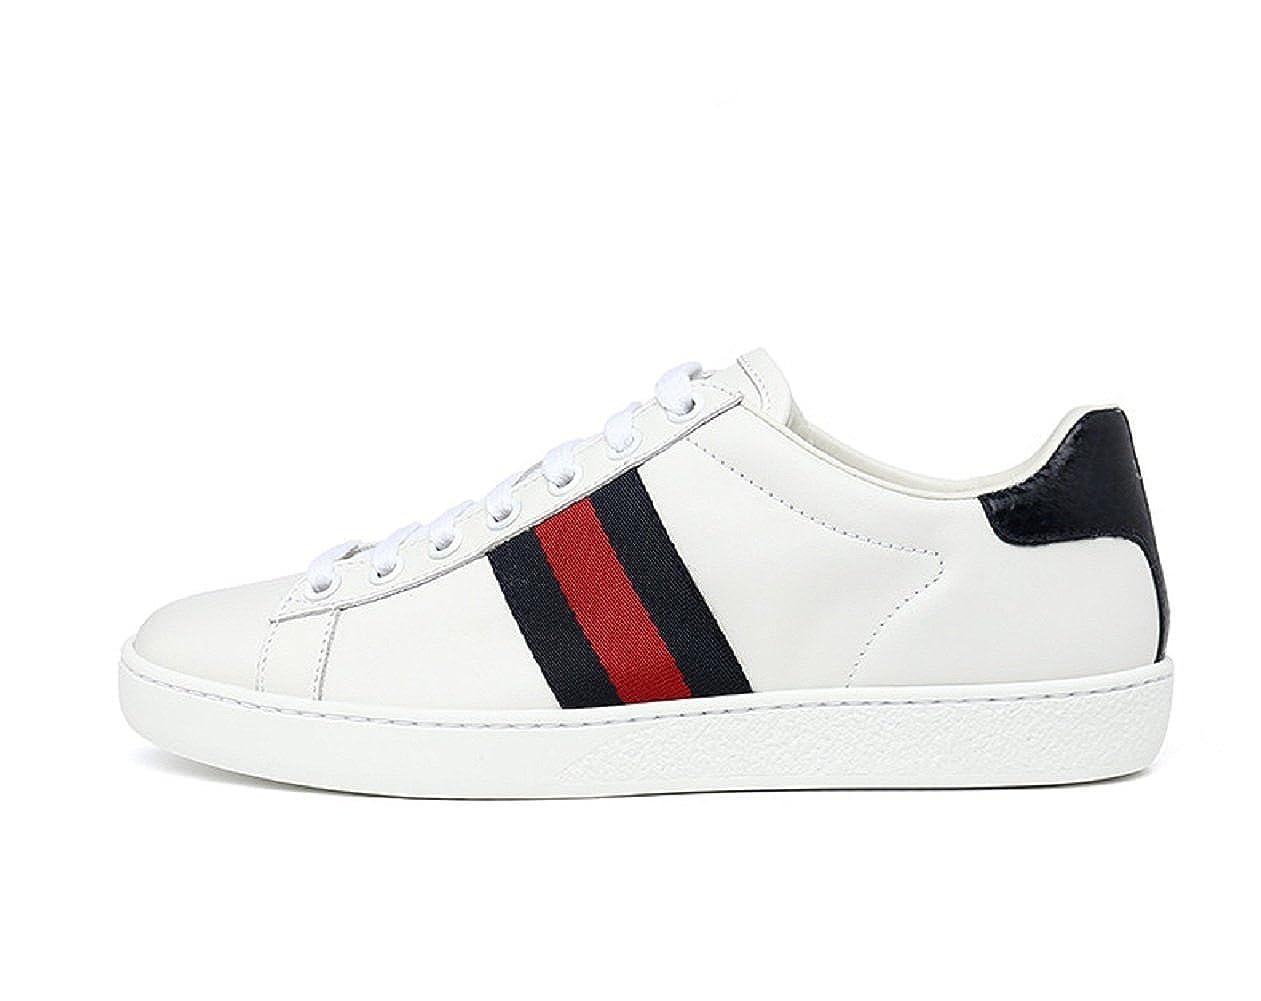 798f08eb04ceb Fashion Lightweight Sneakers For Women Men Walking Sneakers For ...